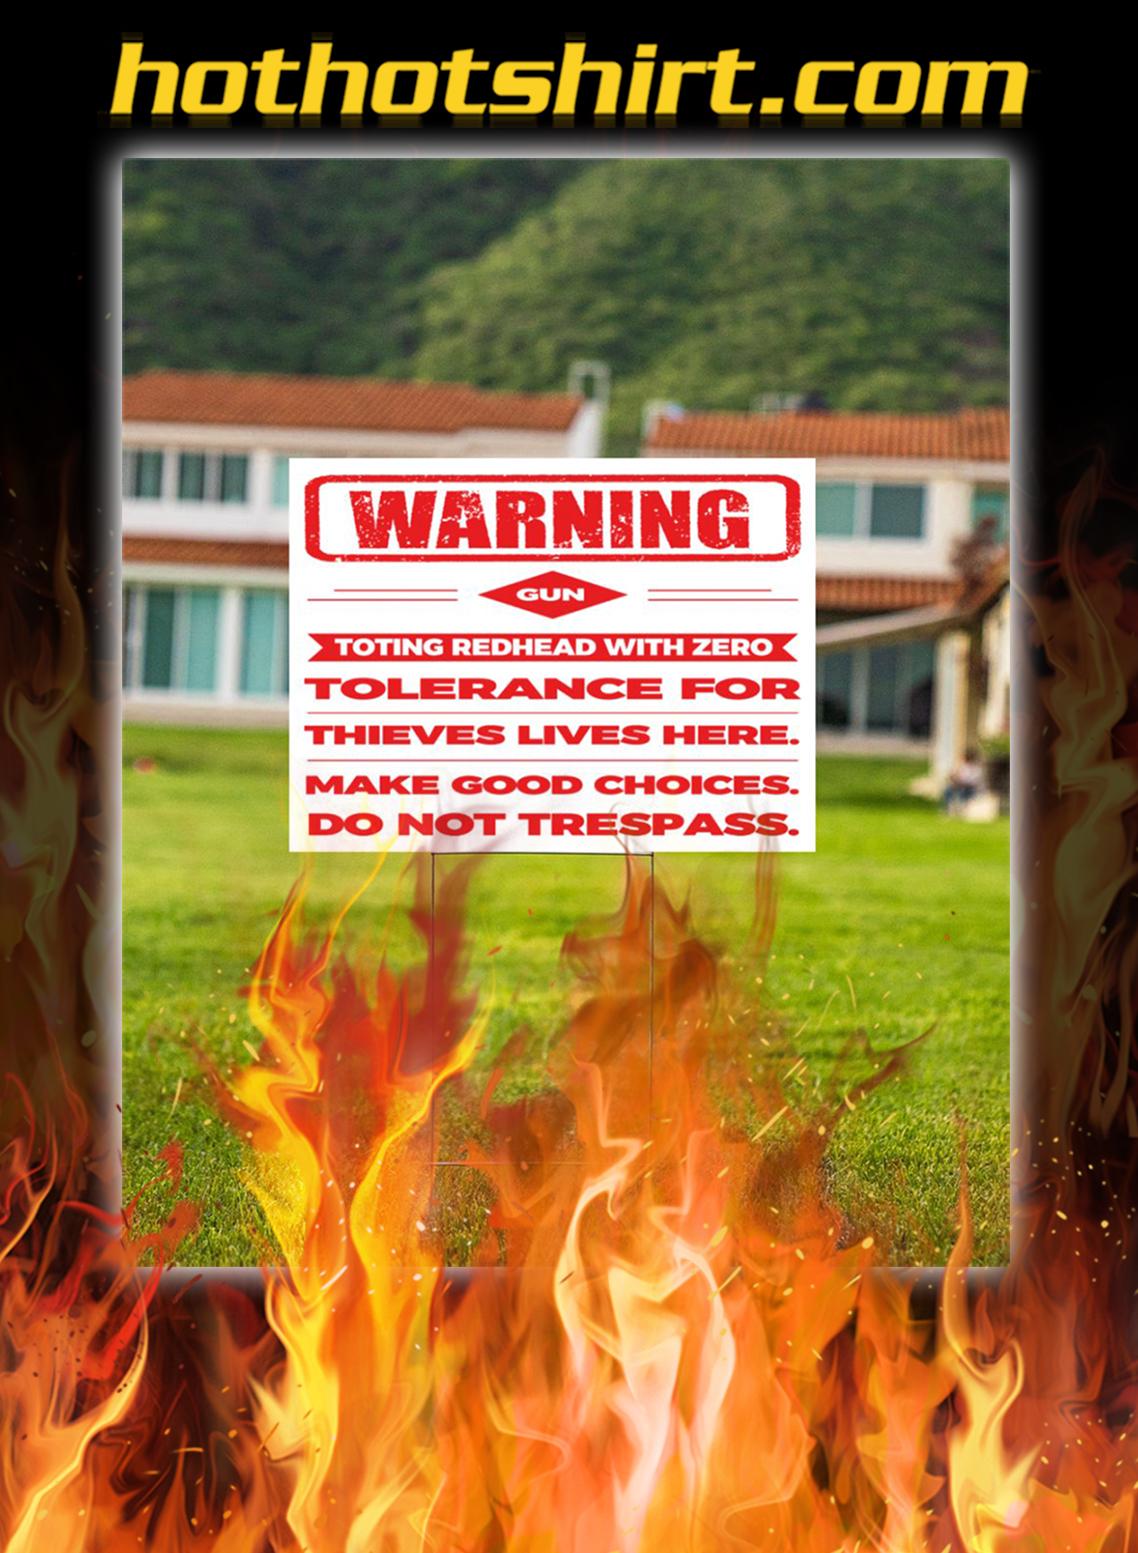 Warning gun toting redhead with zero yard sign- pic 1